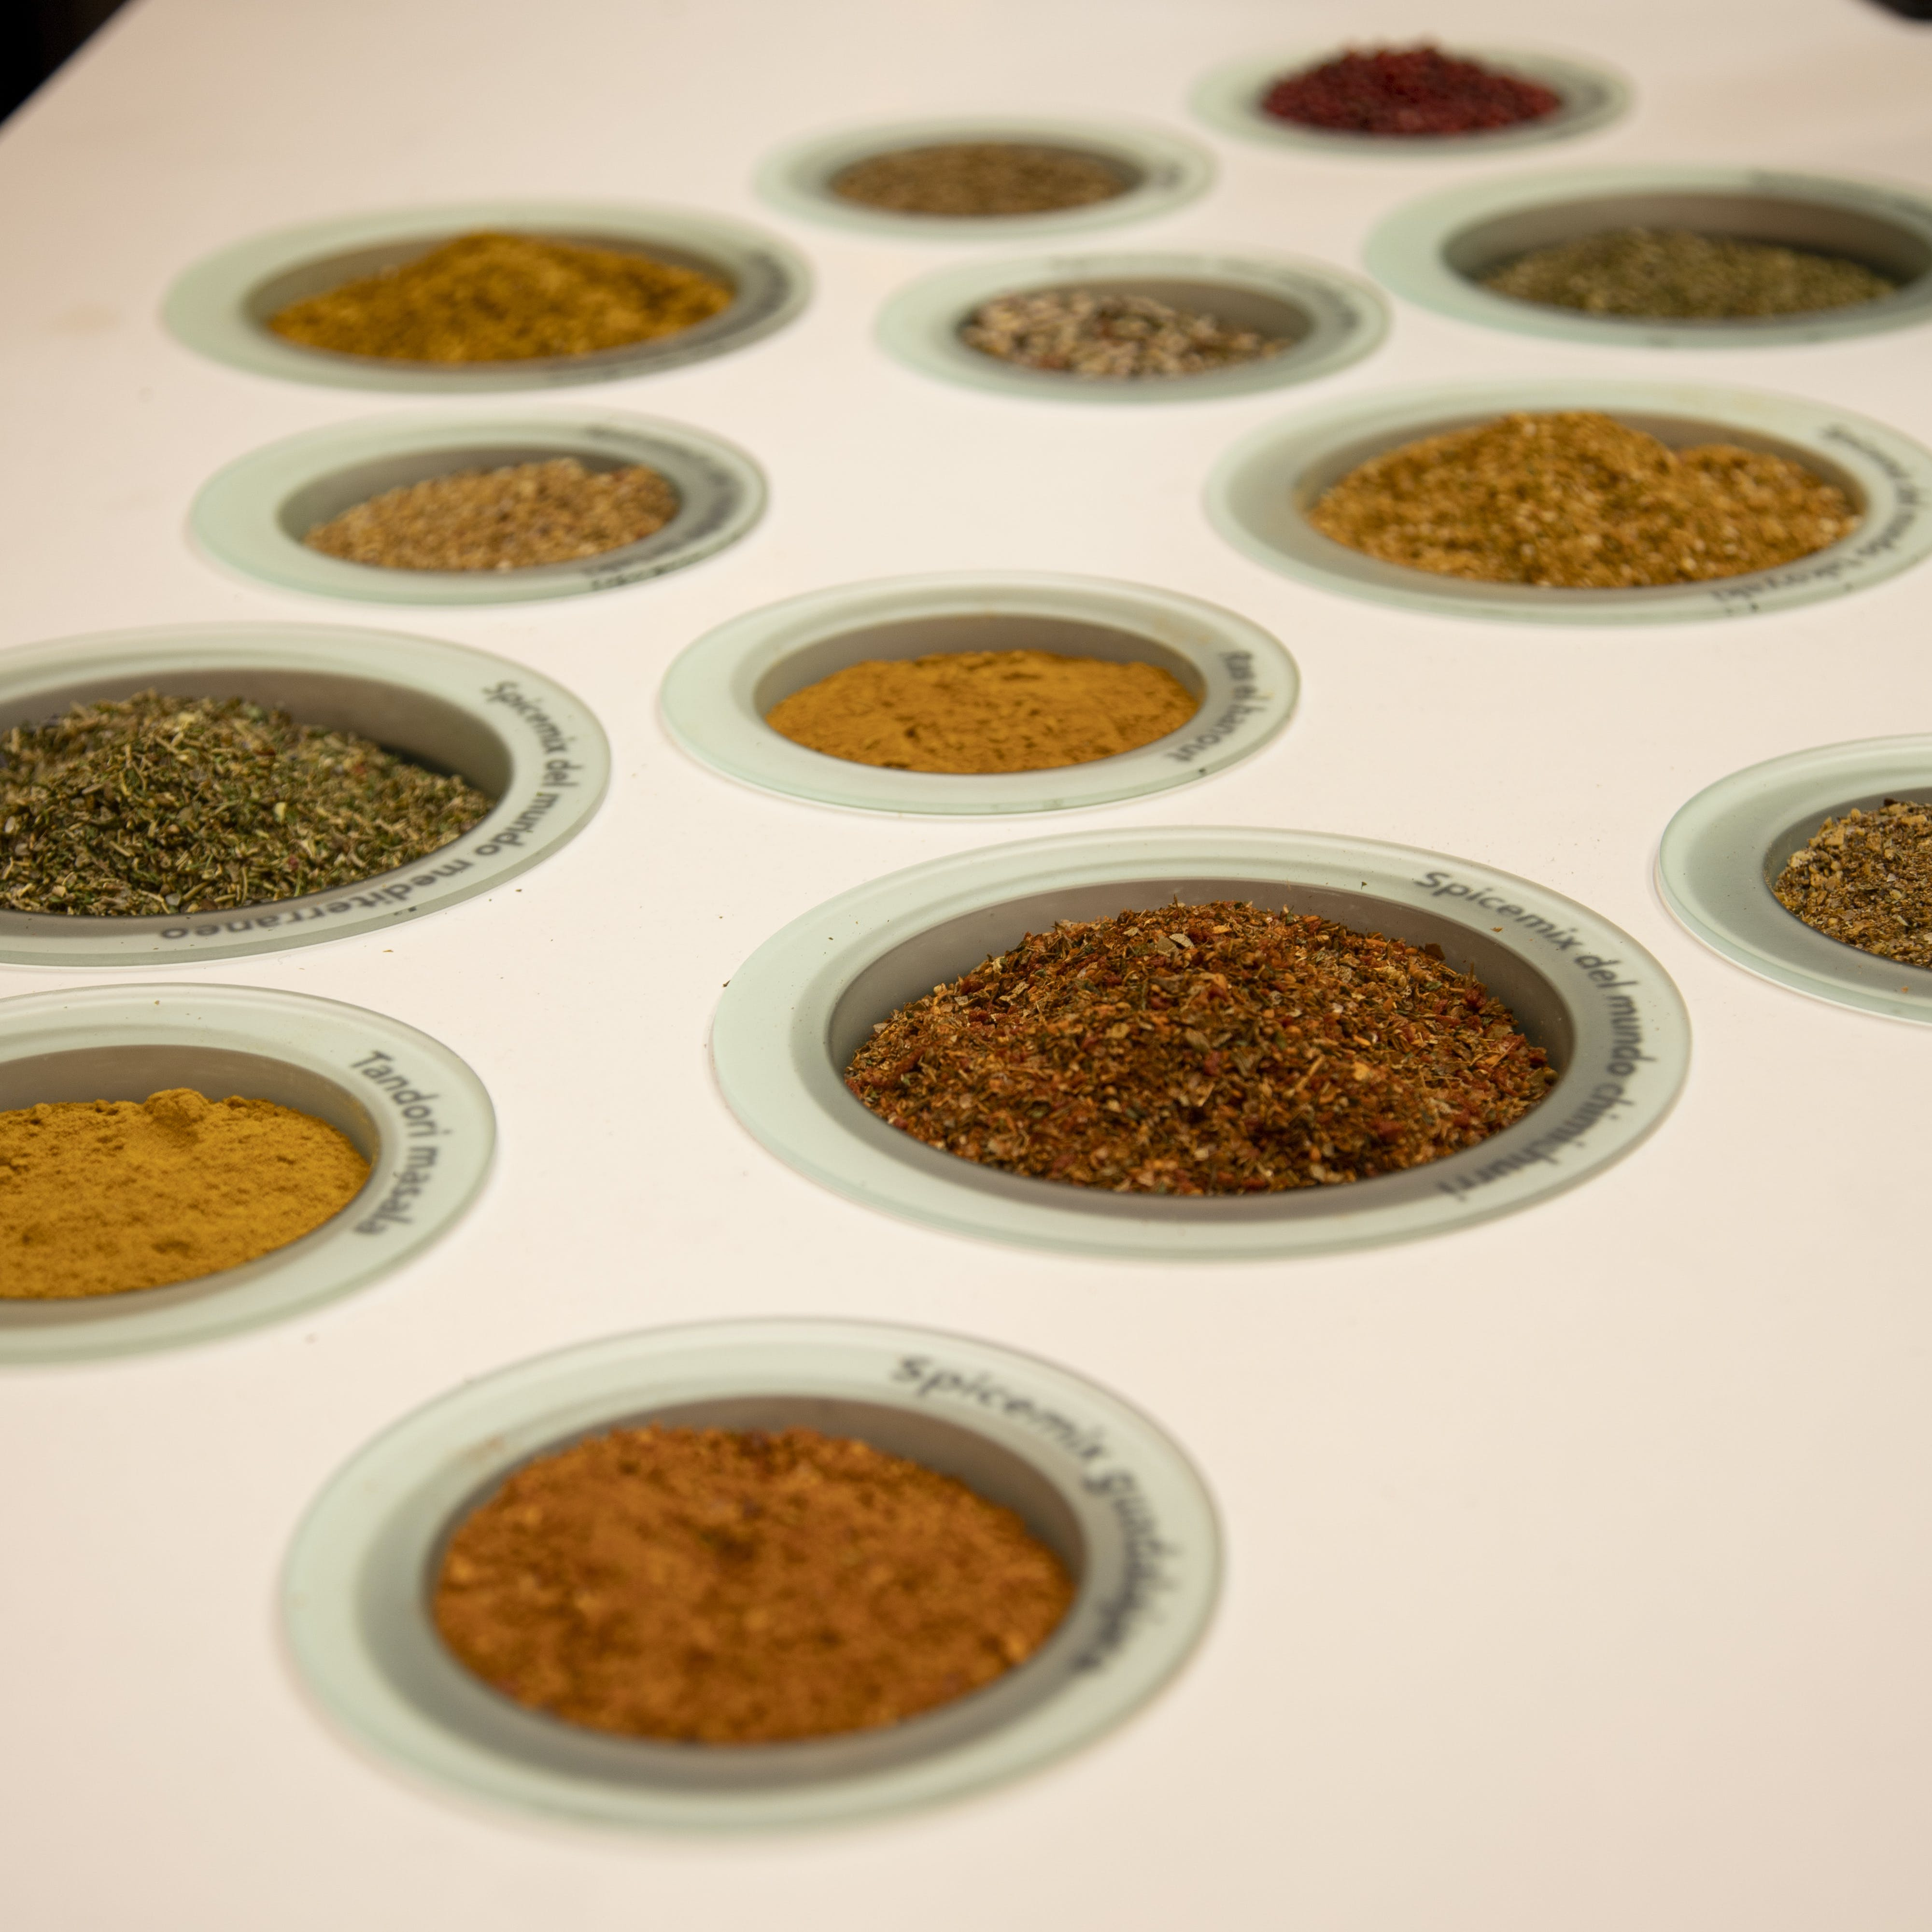 Free stock photo of canela, comino, especias, hierbas